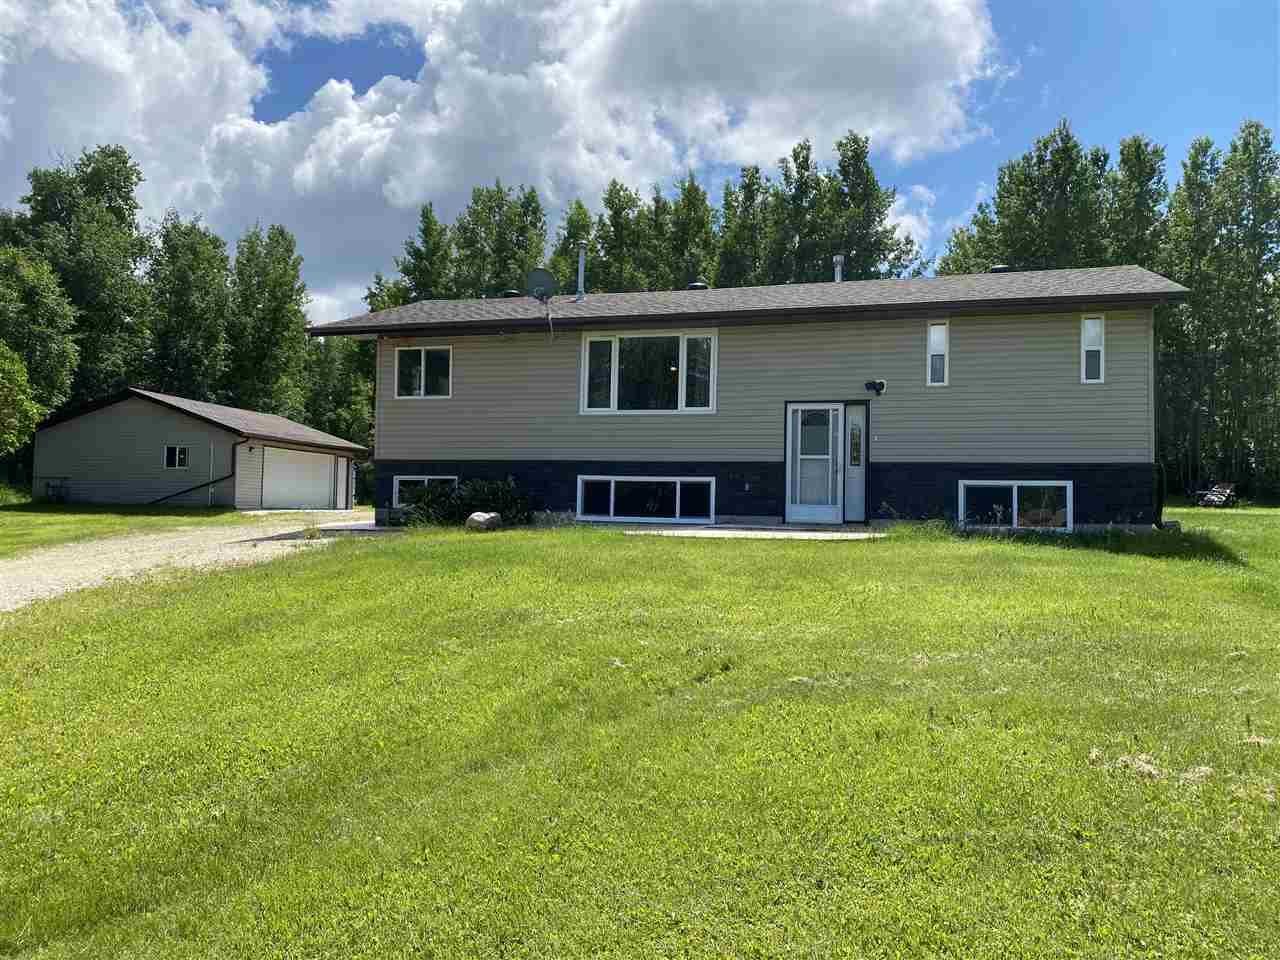 Main Photo: 39 54126 RR30: Rural Lac Ste. Anne County House for sale : MLS®# E4204394